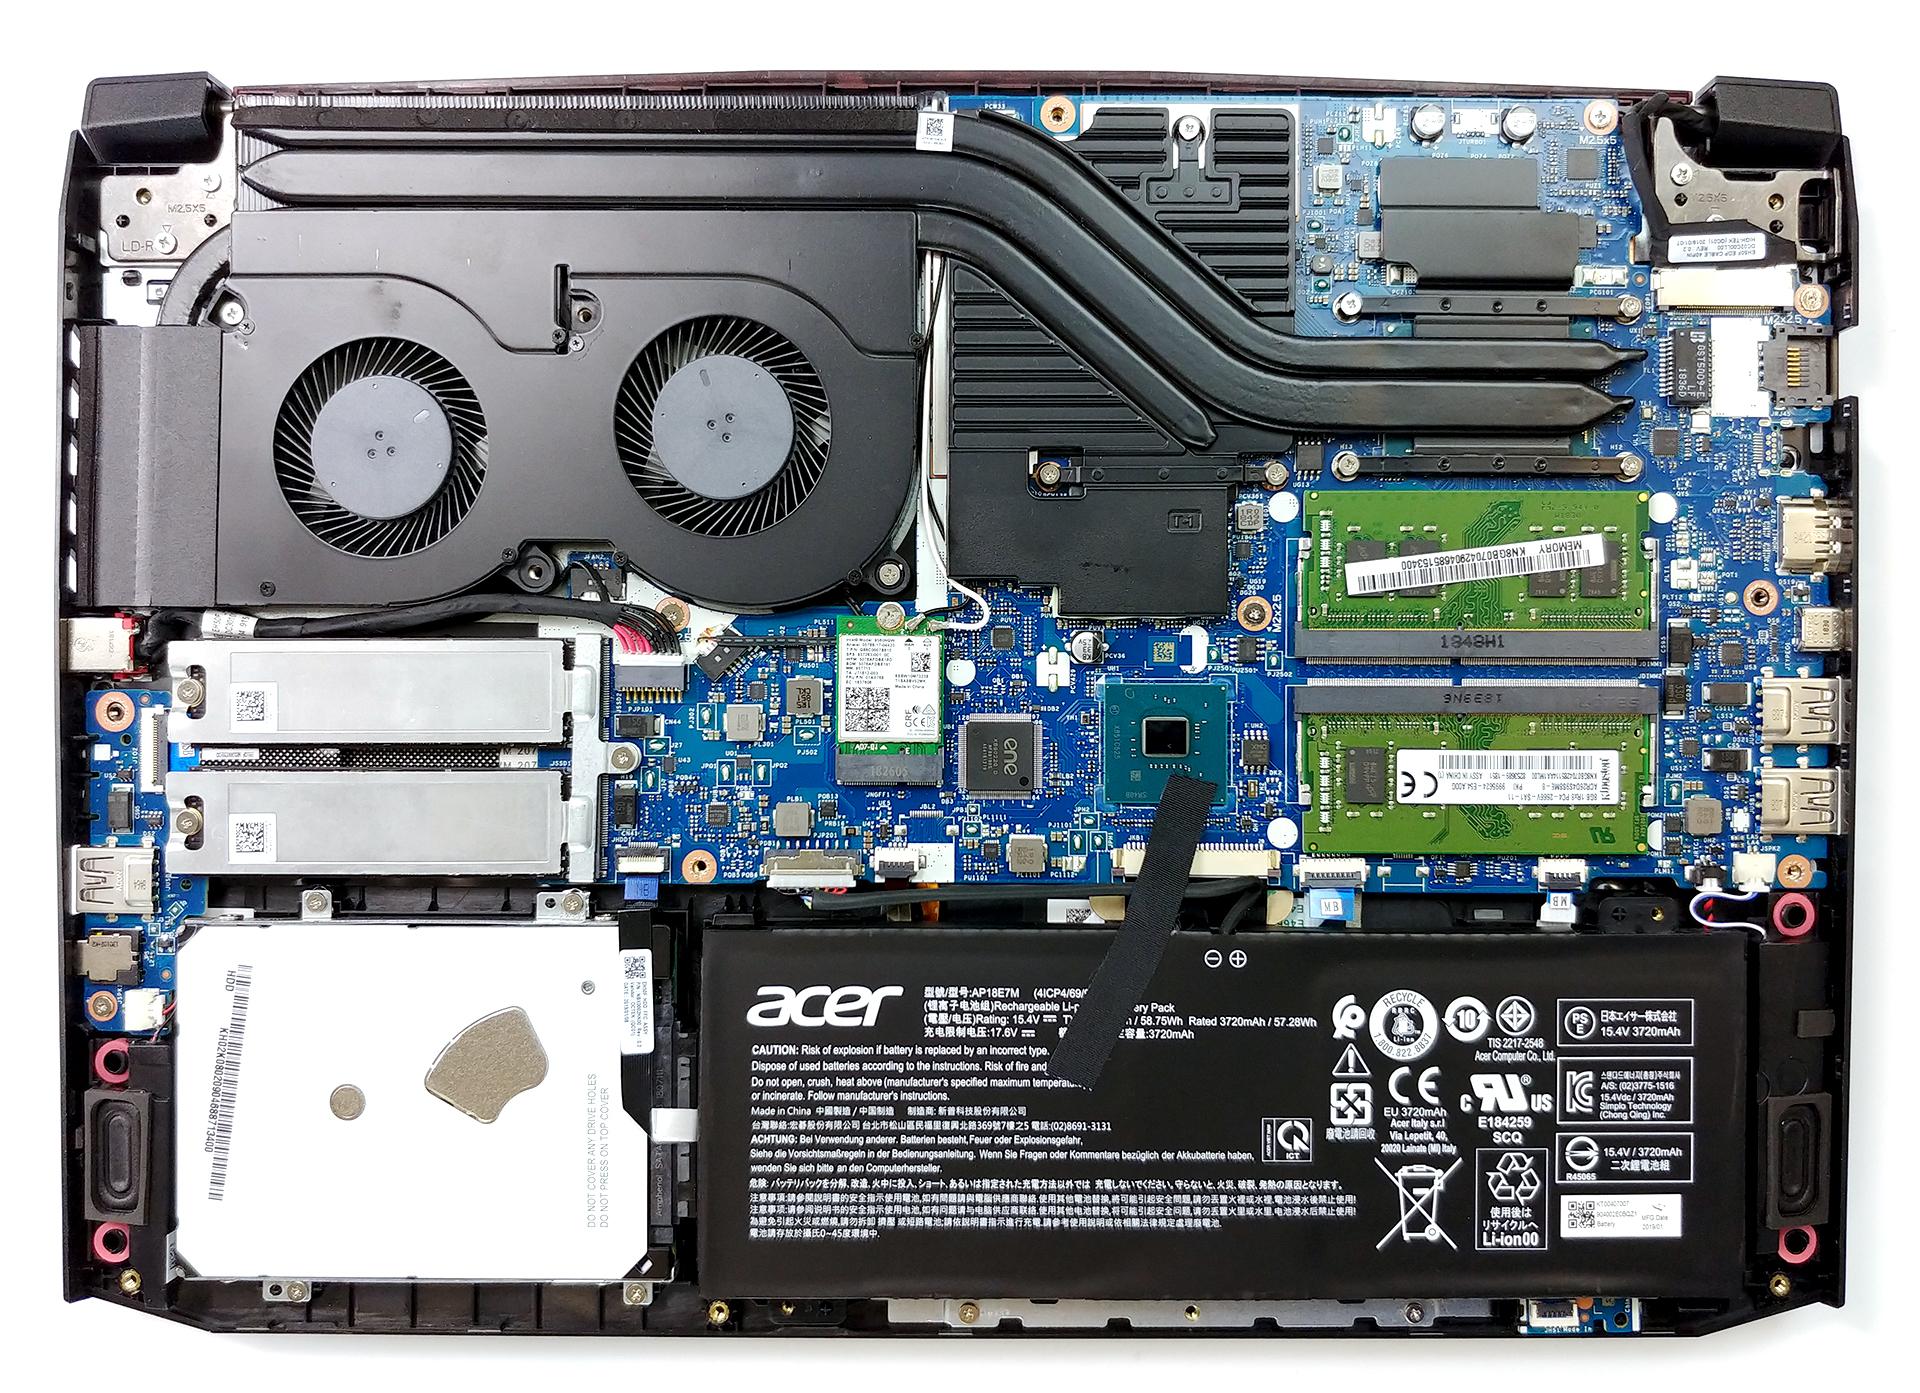 Acer Nitro 5 (AN515-54) (GeForce GTX 1660 Ti) review